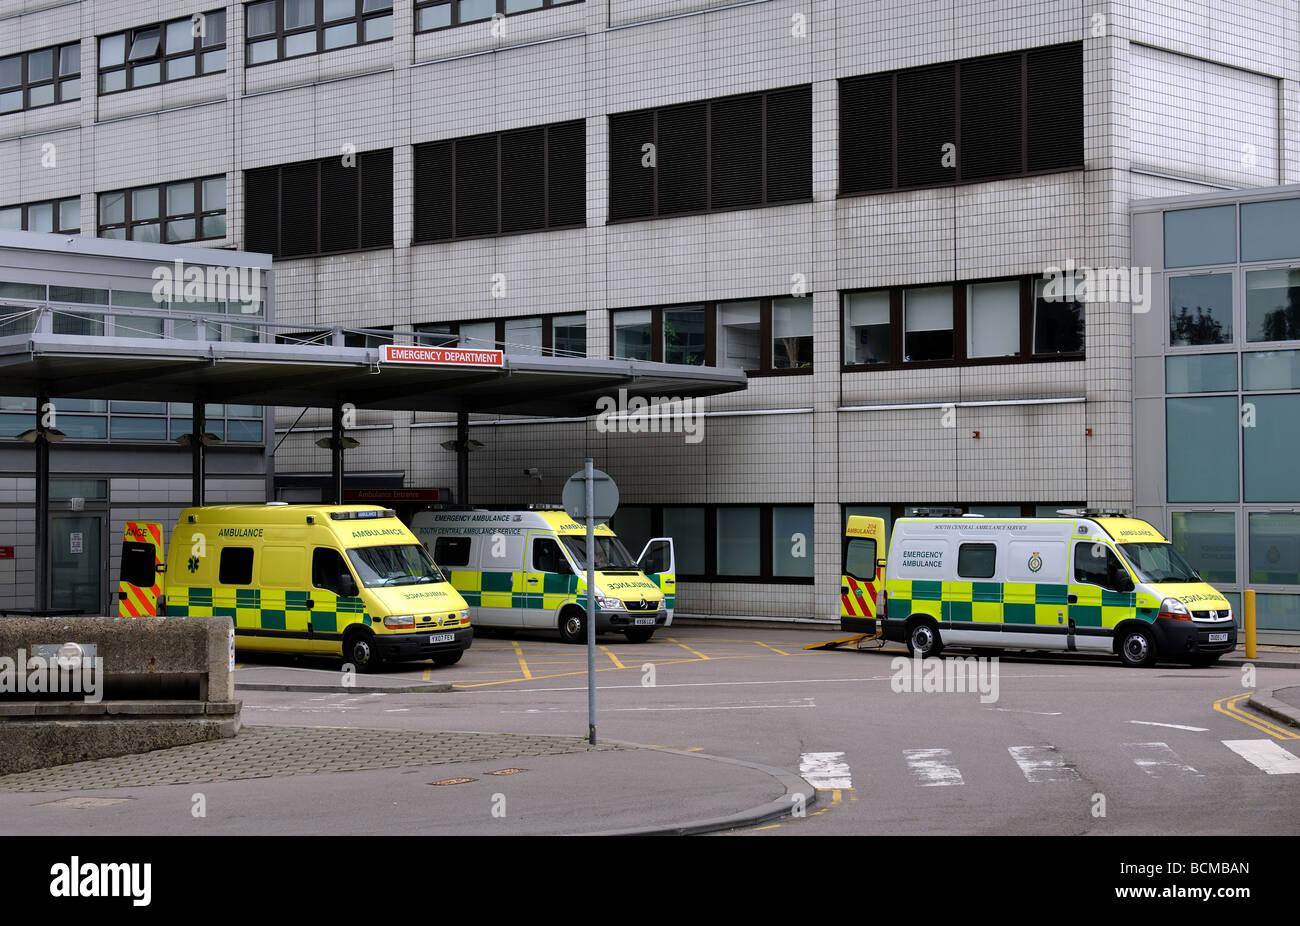 Las ambulancias en el hospital John Radcliffe, Headington, Oxford, Inglaterra, Reino Unido. Foto de stock